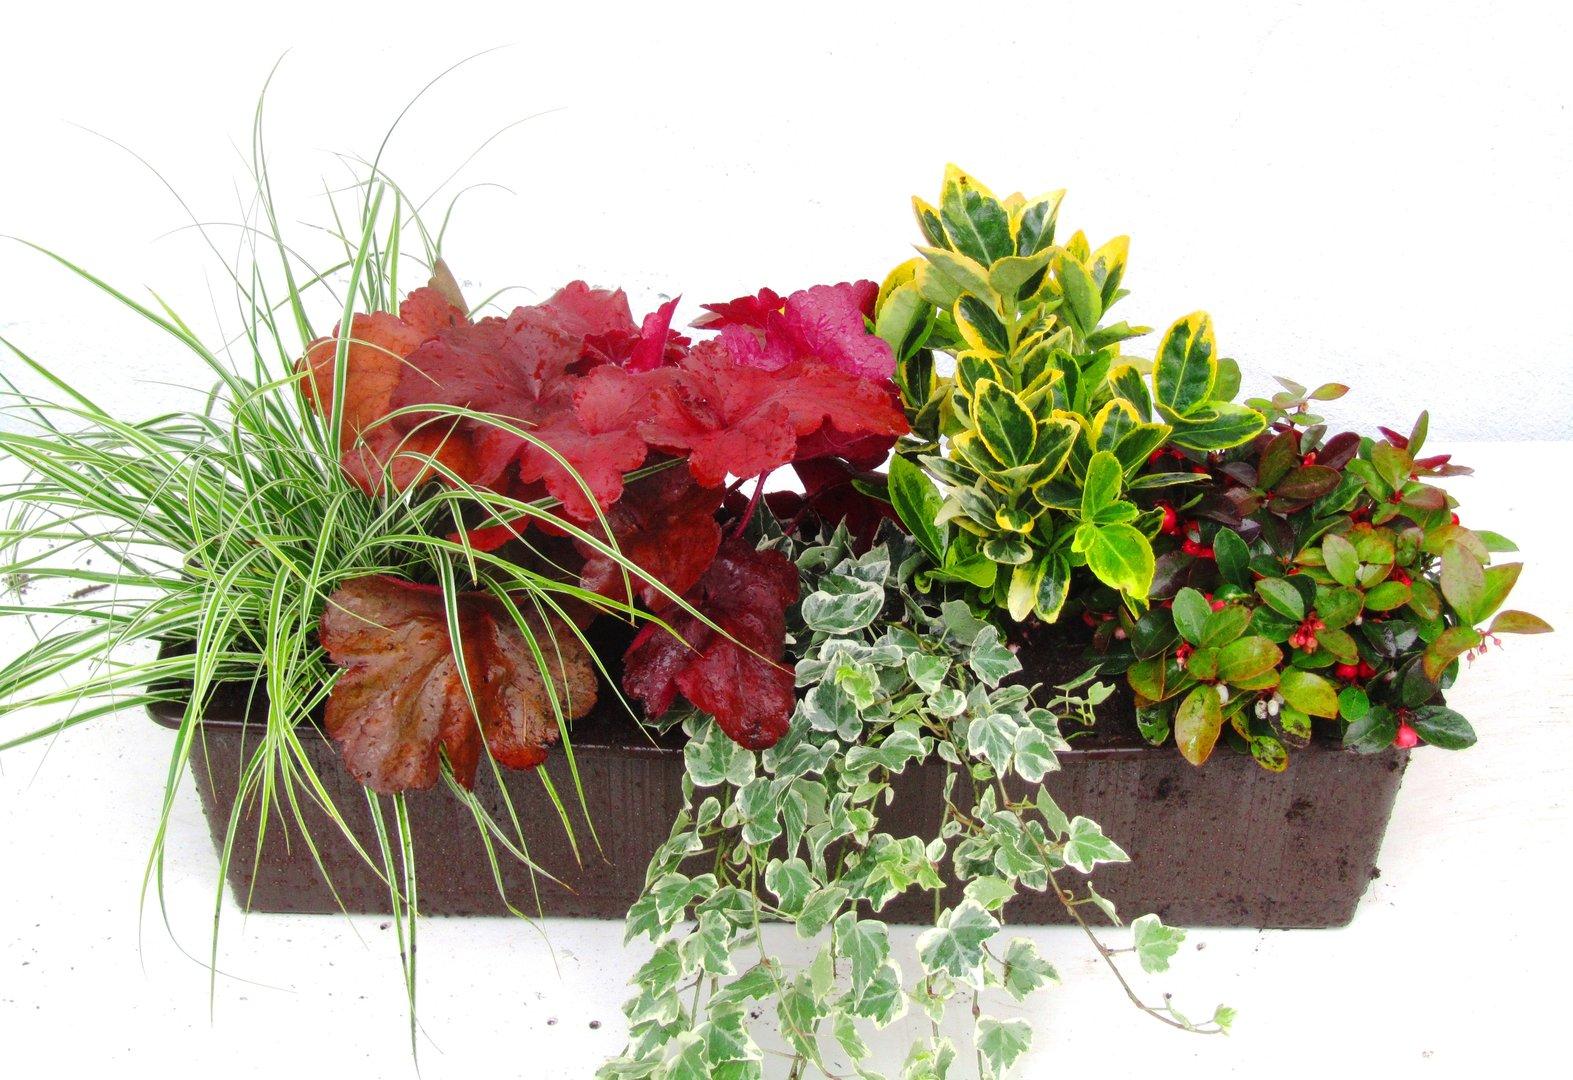 balkonpflanzen set f r balkonk sten 60 cm lang pflanzen. Black Bedroom Furniture Sets. Home Design Ideas